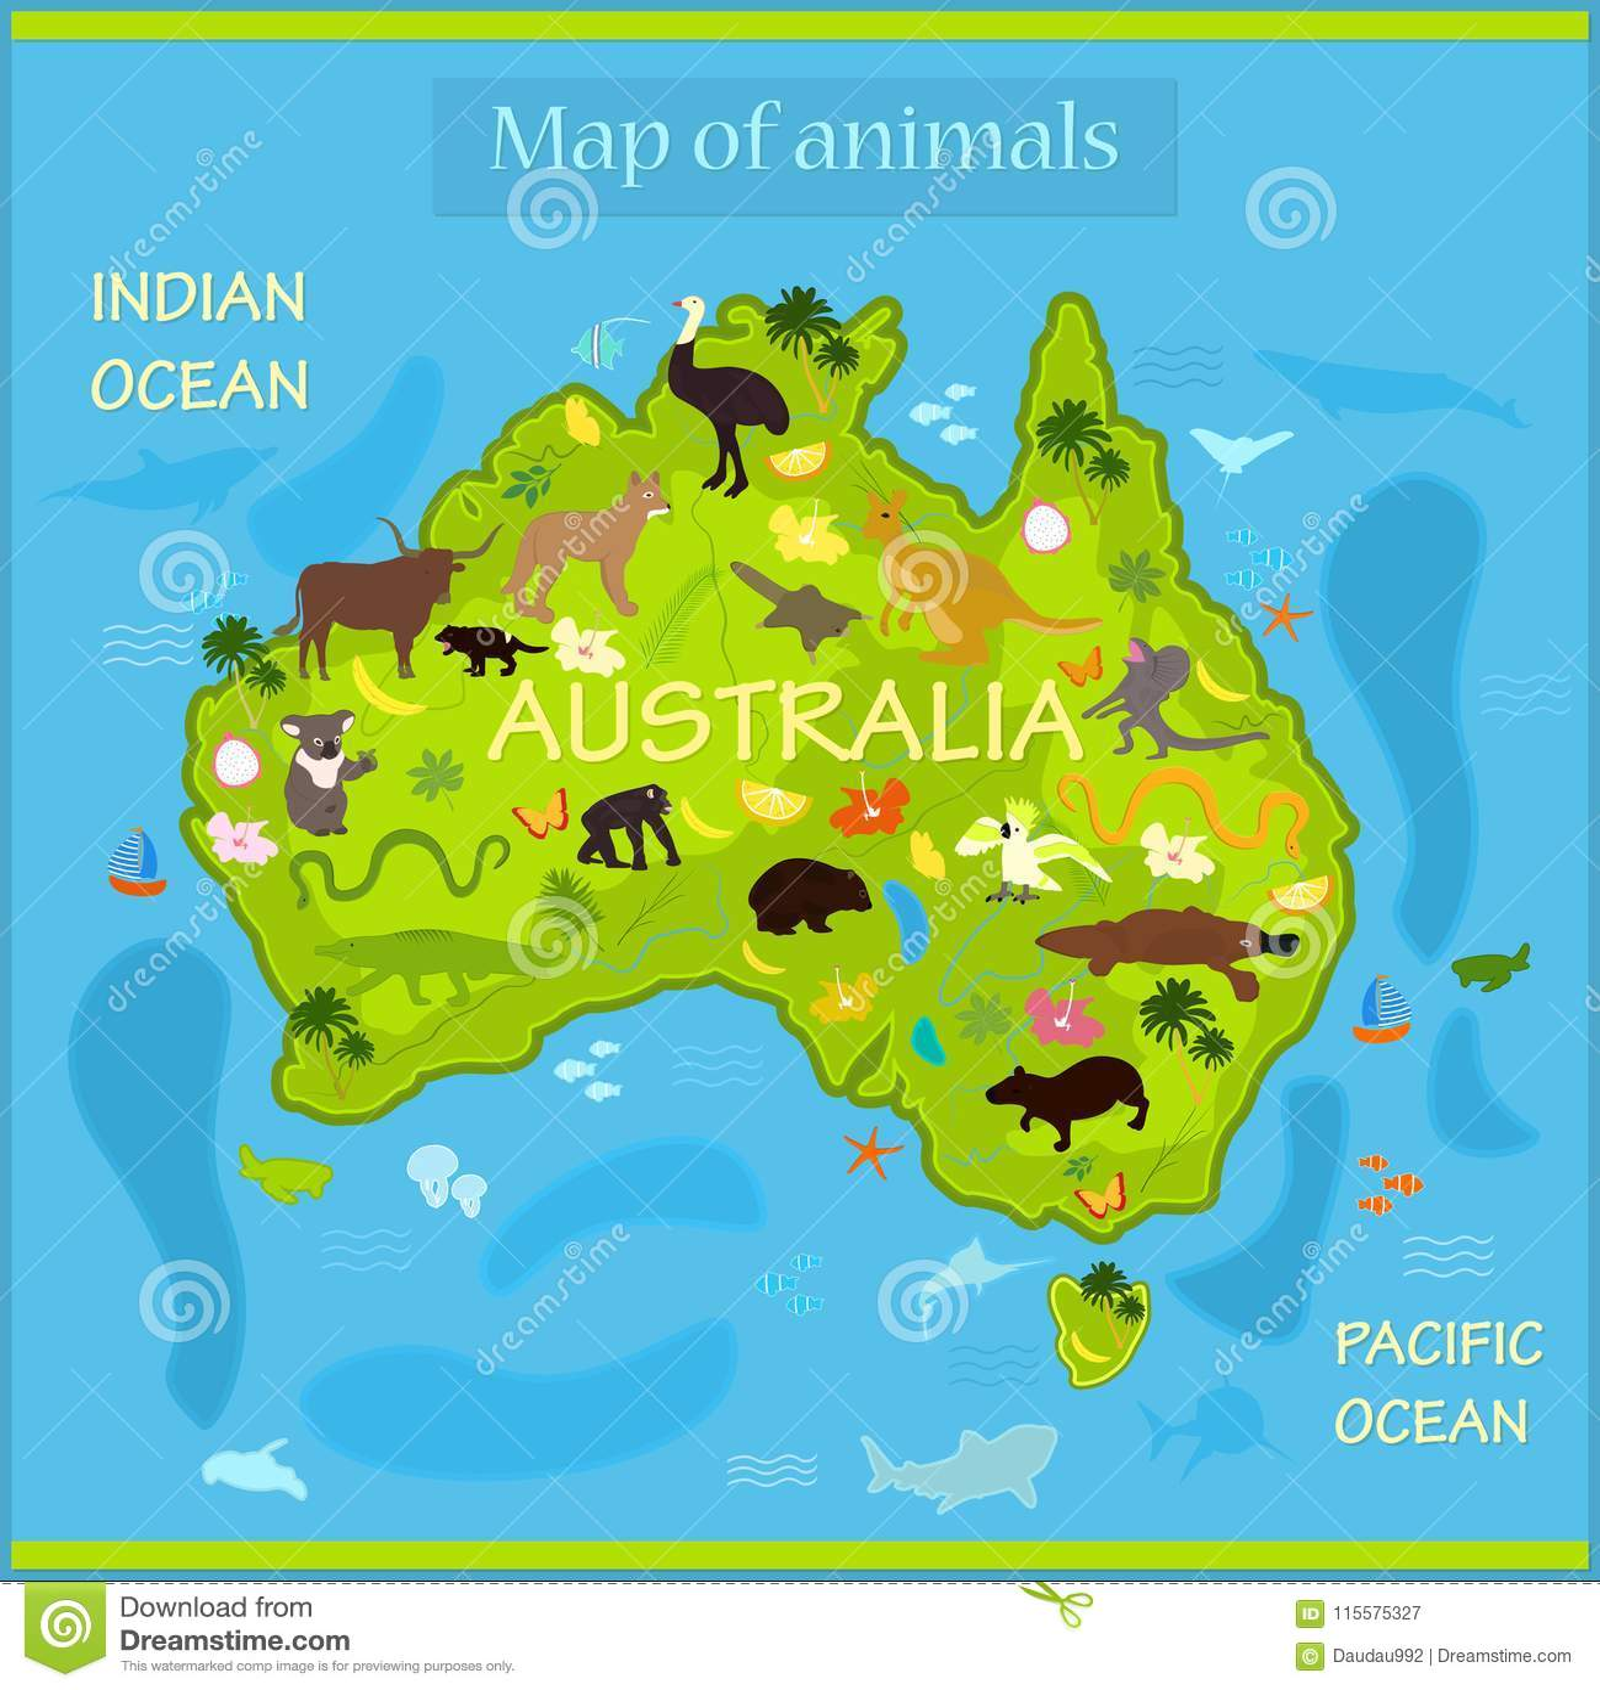 Vector Map Of Animals In Australia Stock Vector Illustration Of